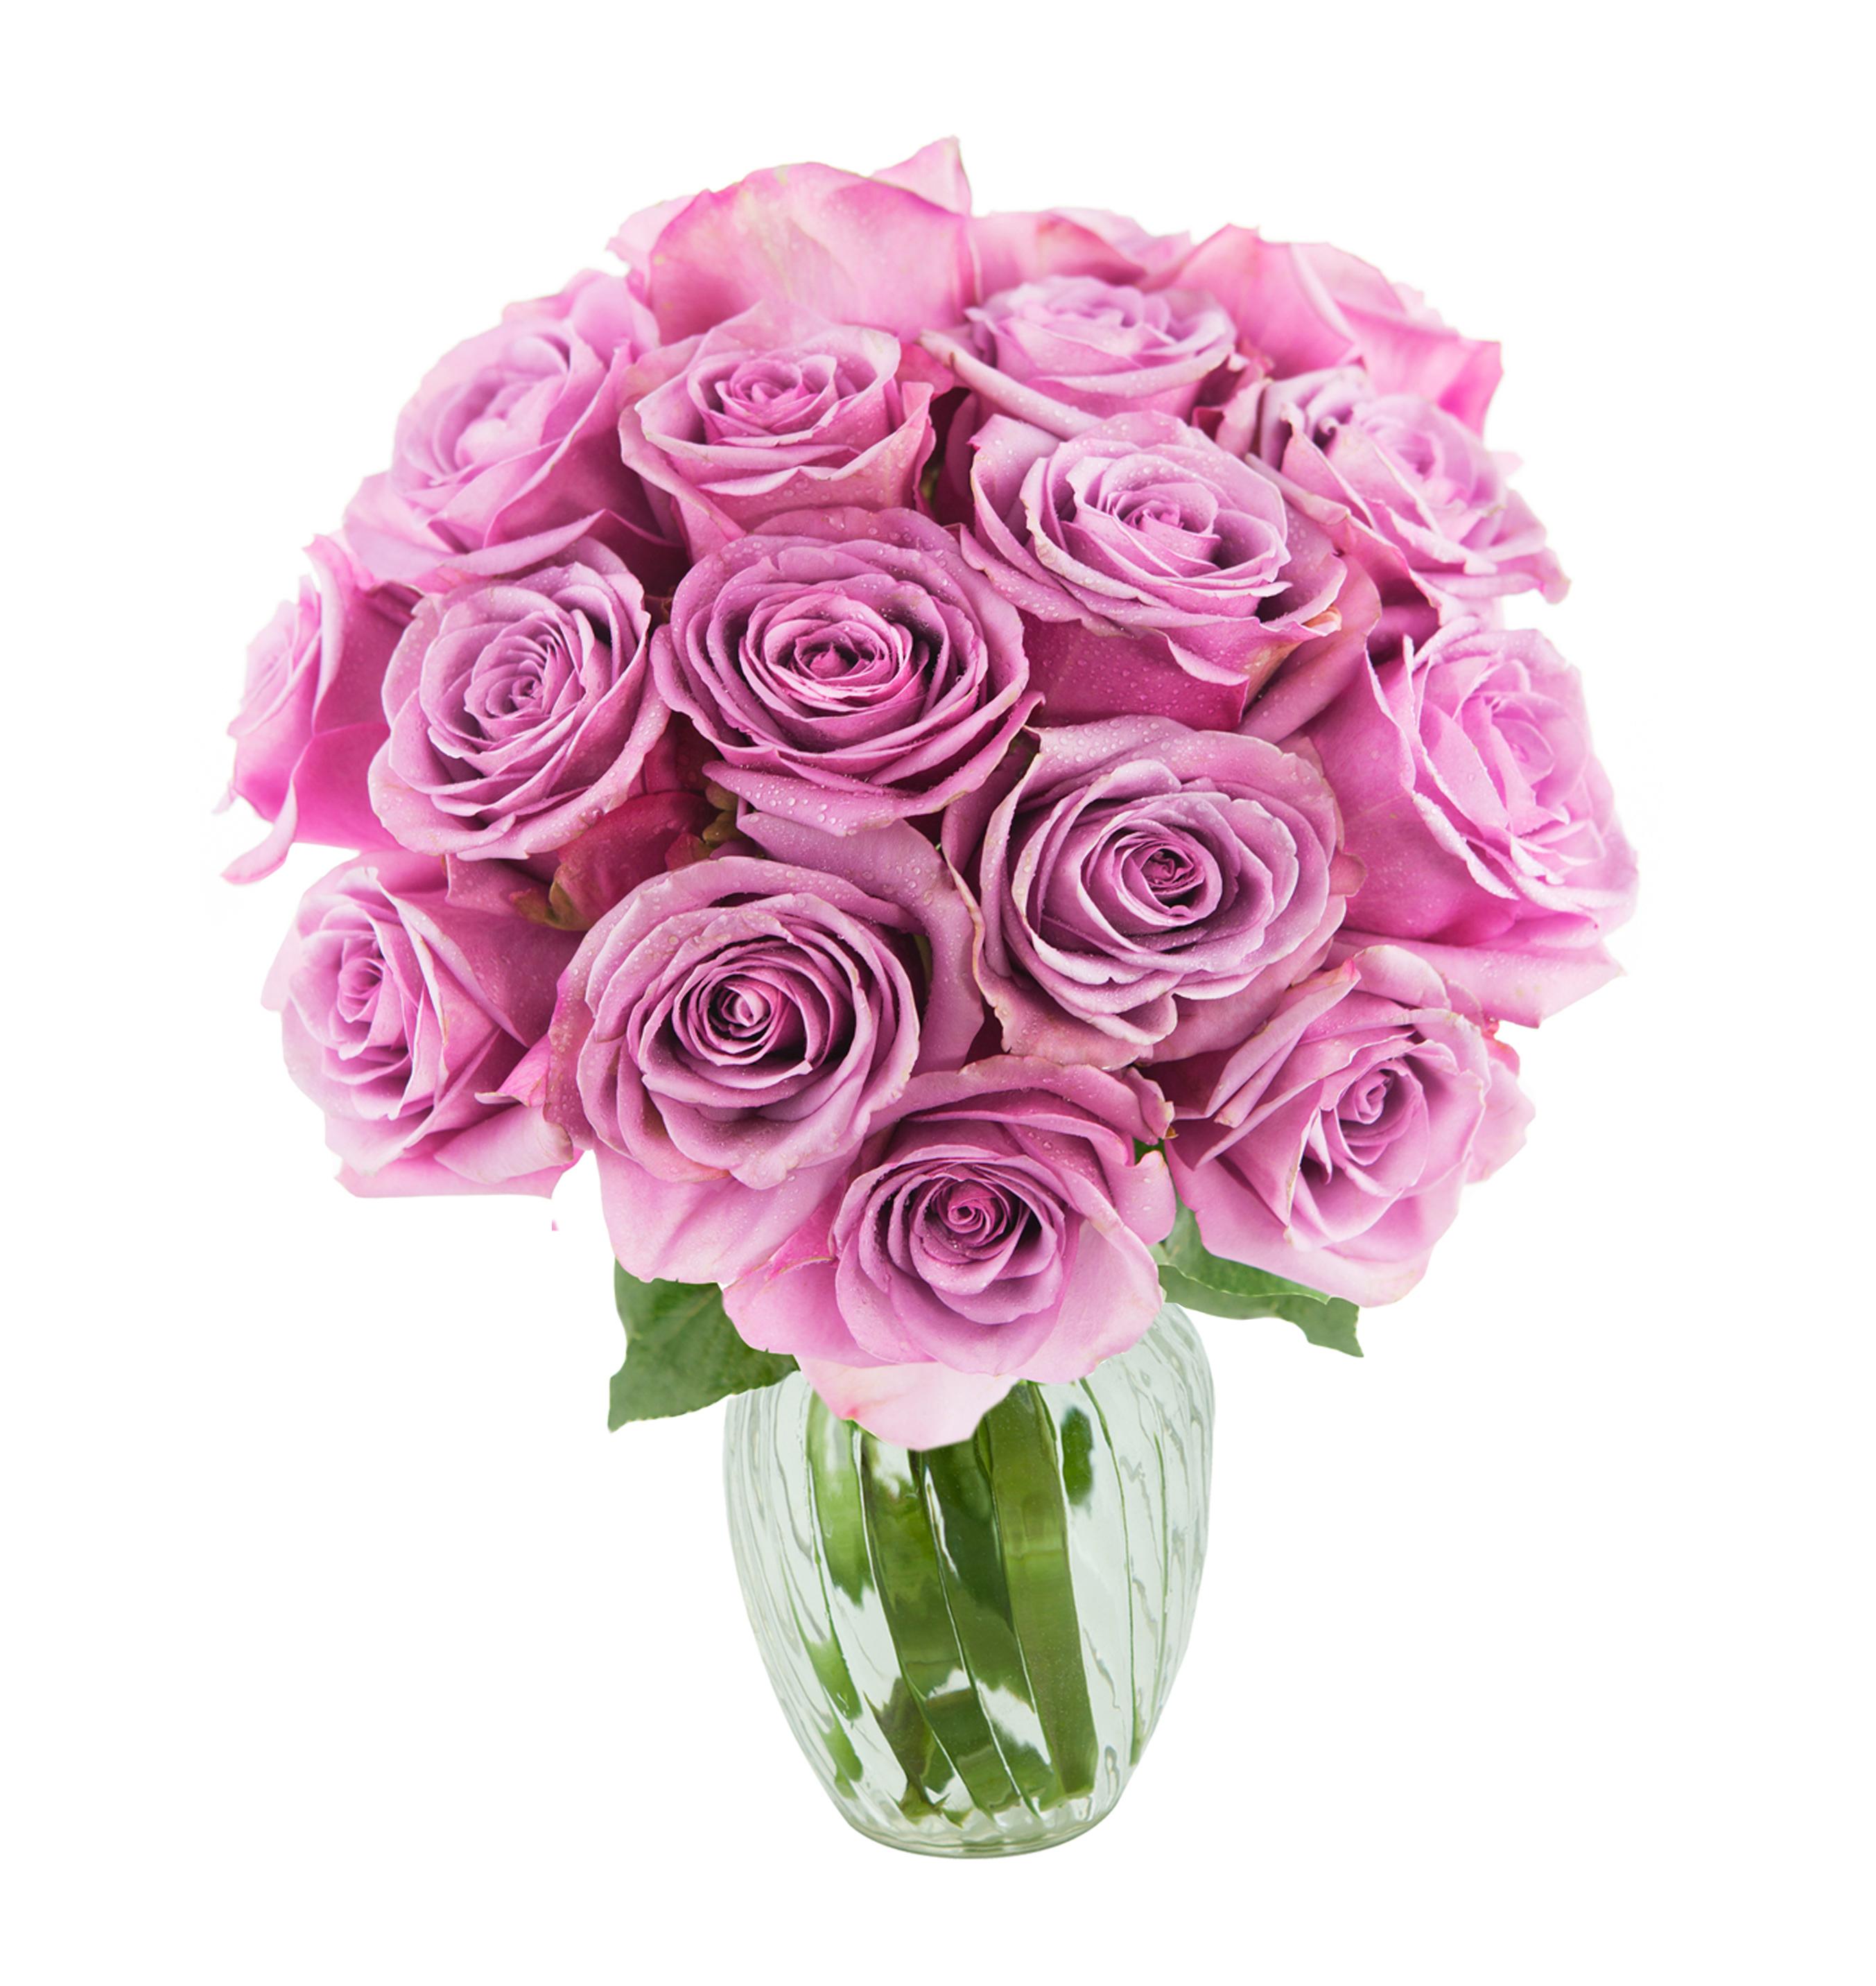 Kabloom Bouquet of 18 Fresh Purple Roses (Farm-Fresh, Long-Stem) with Vase